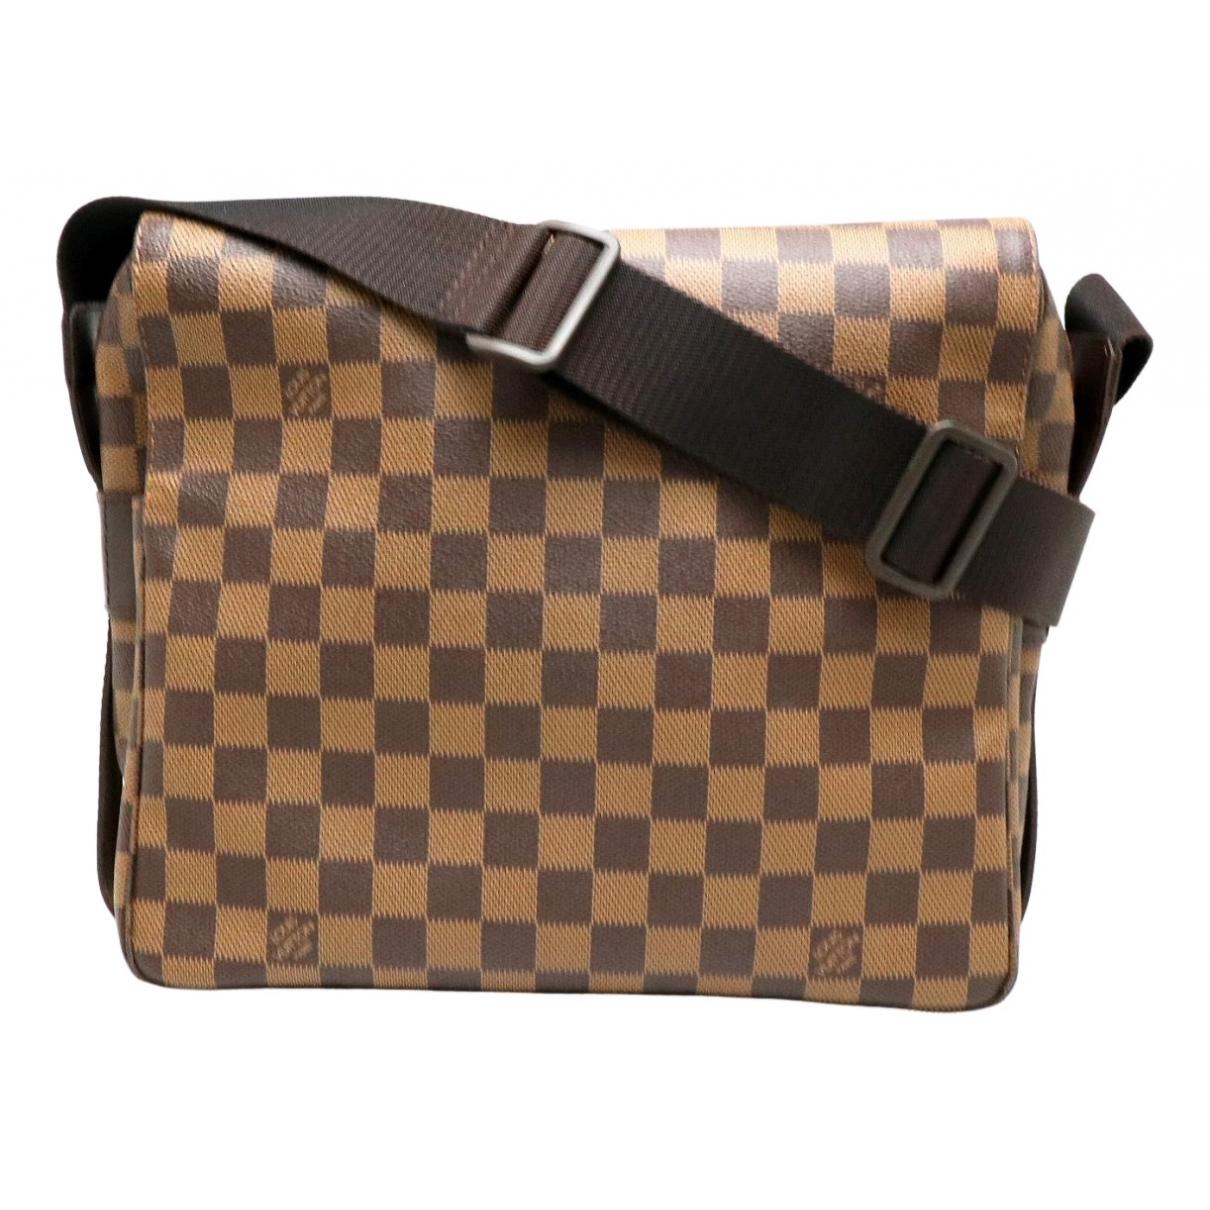 Louis Vuitton - Sac a main Naviglio pour femme en toile - marron